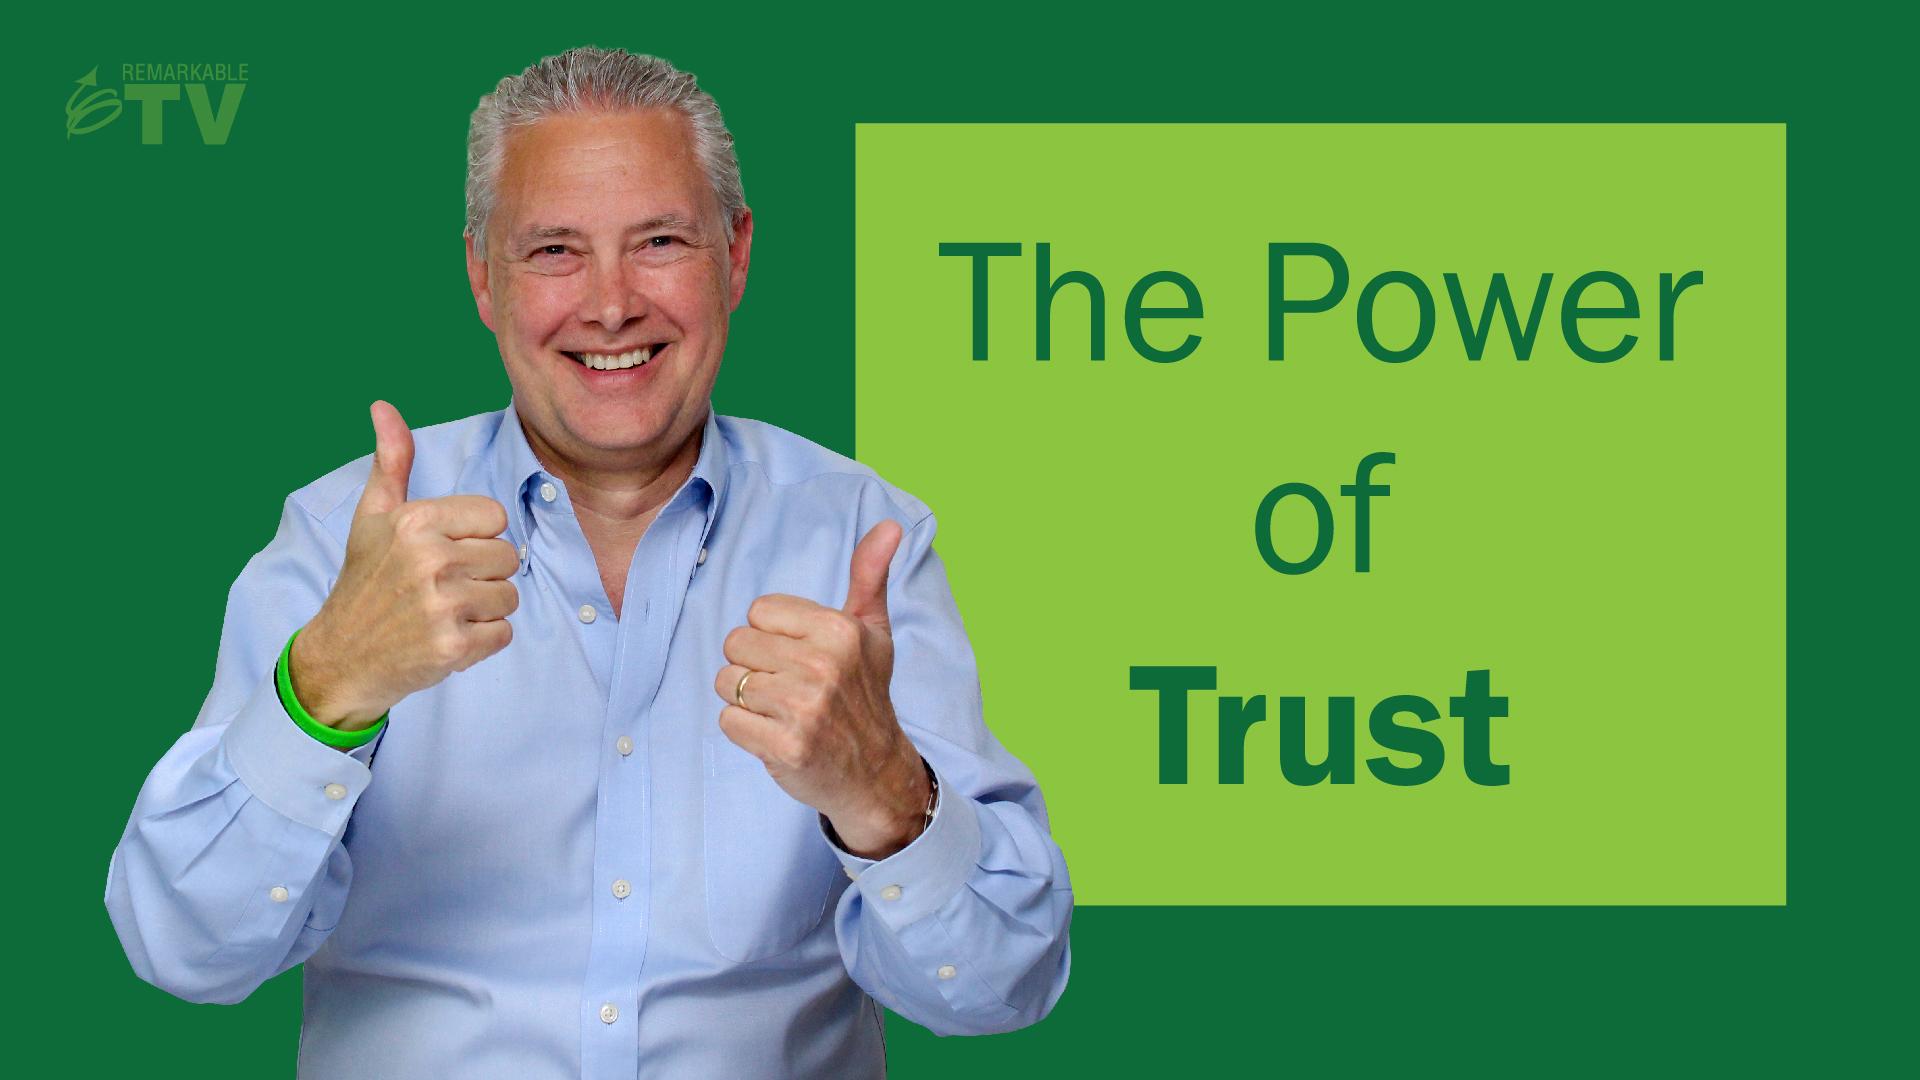 Video Splash Image: The Power of Trust